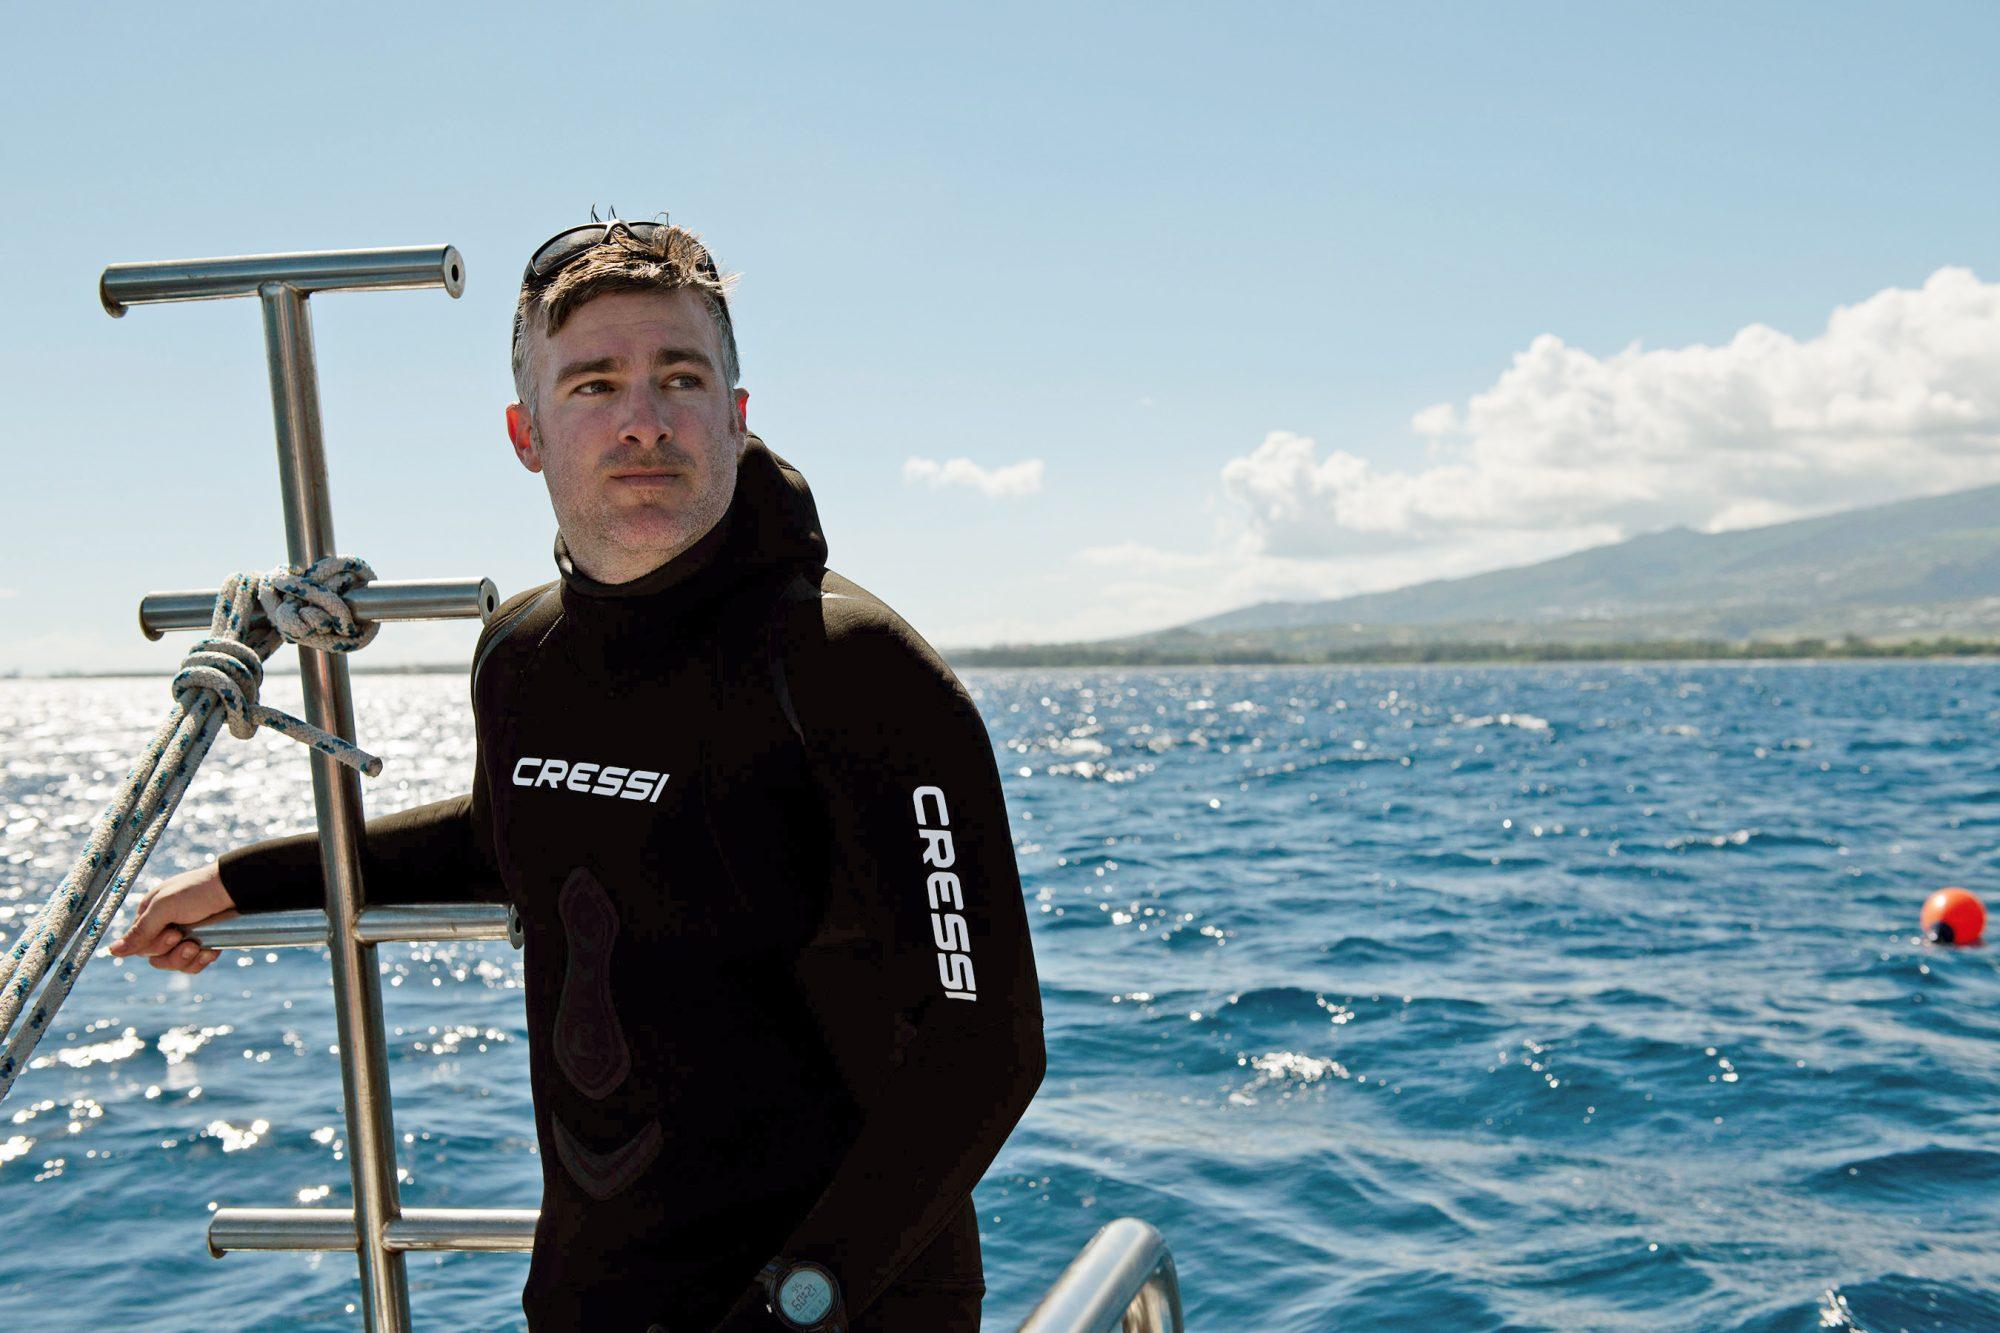 RETURN TO SHARK ISLAND